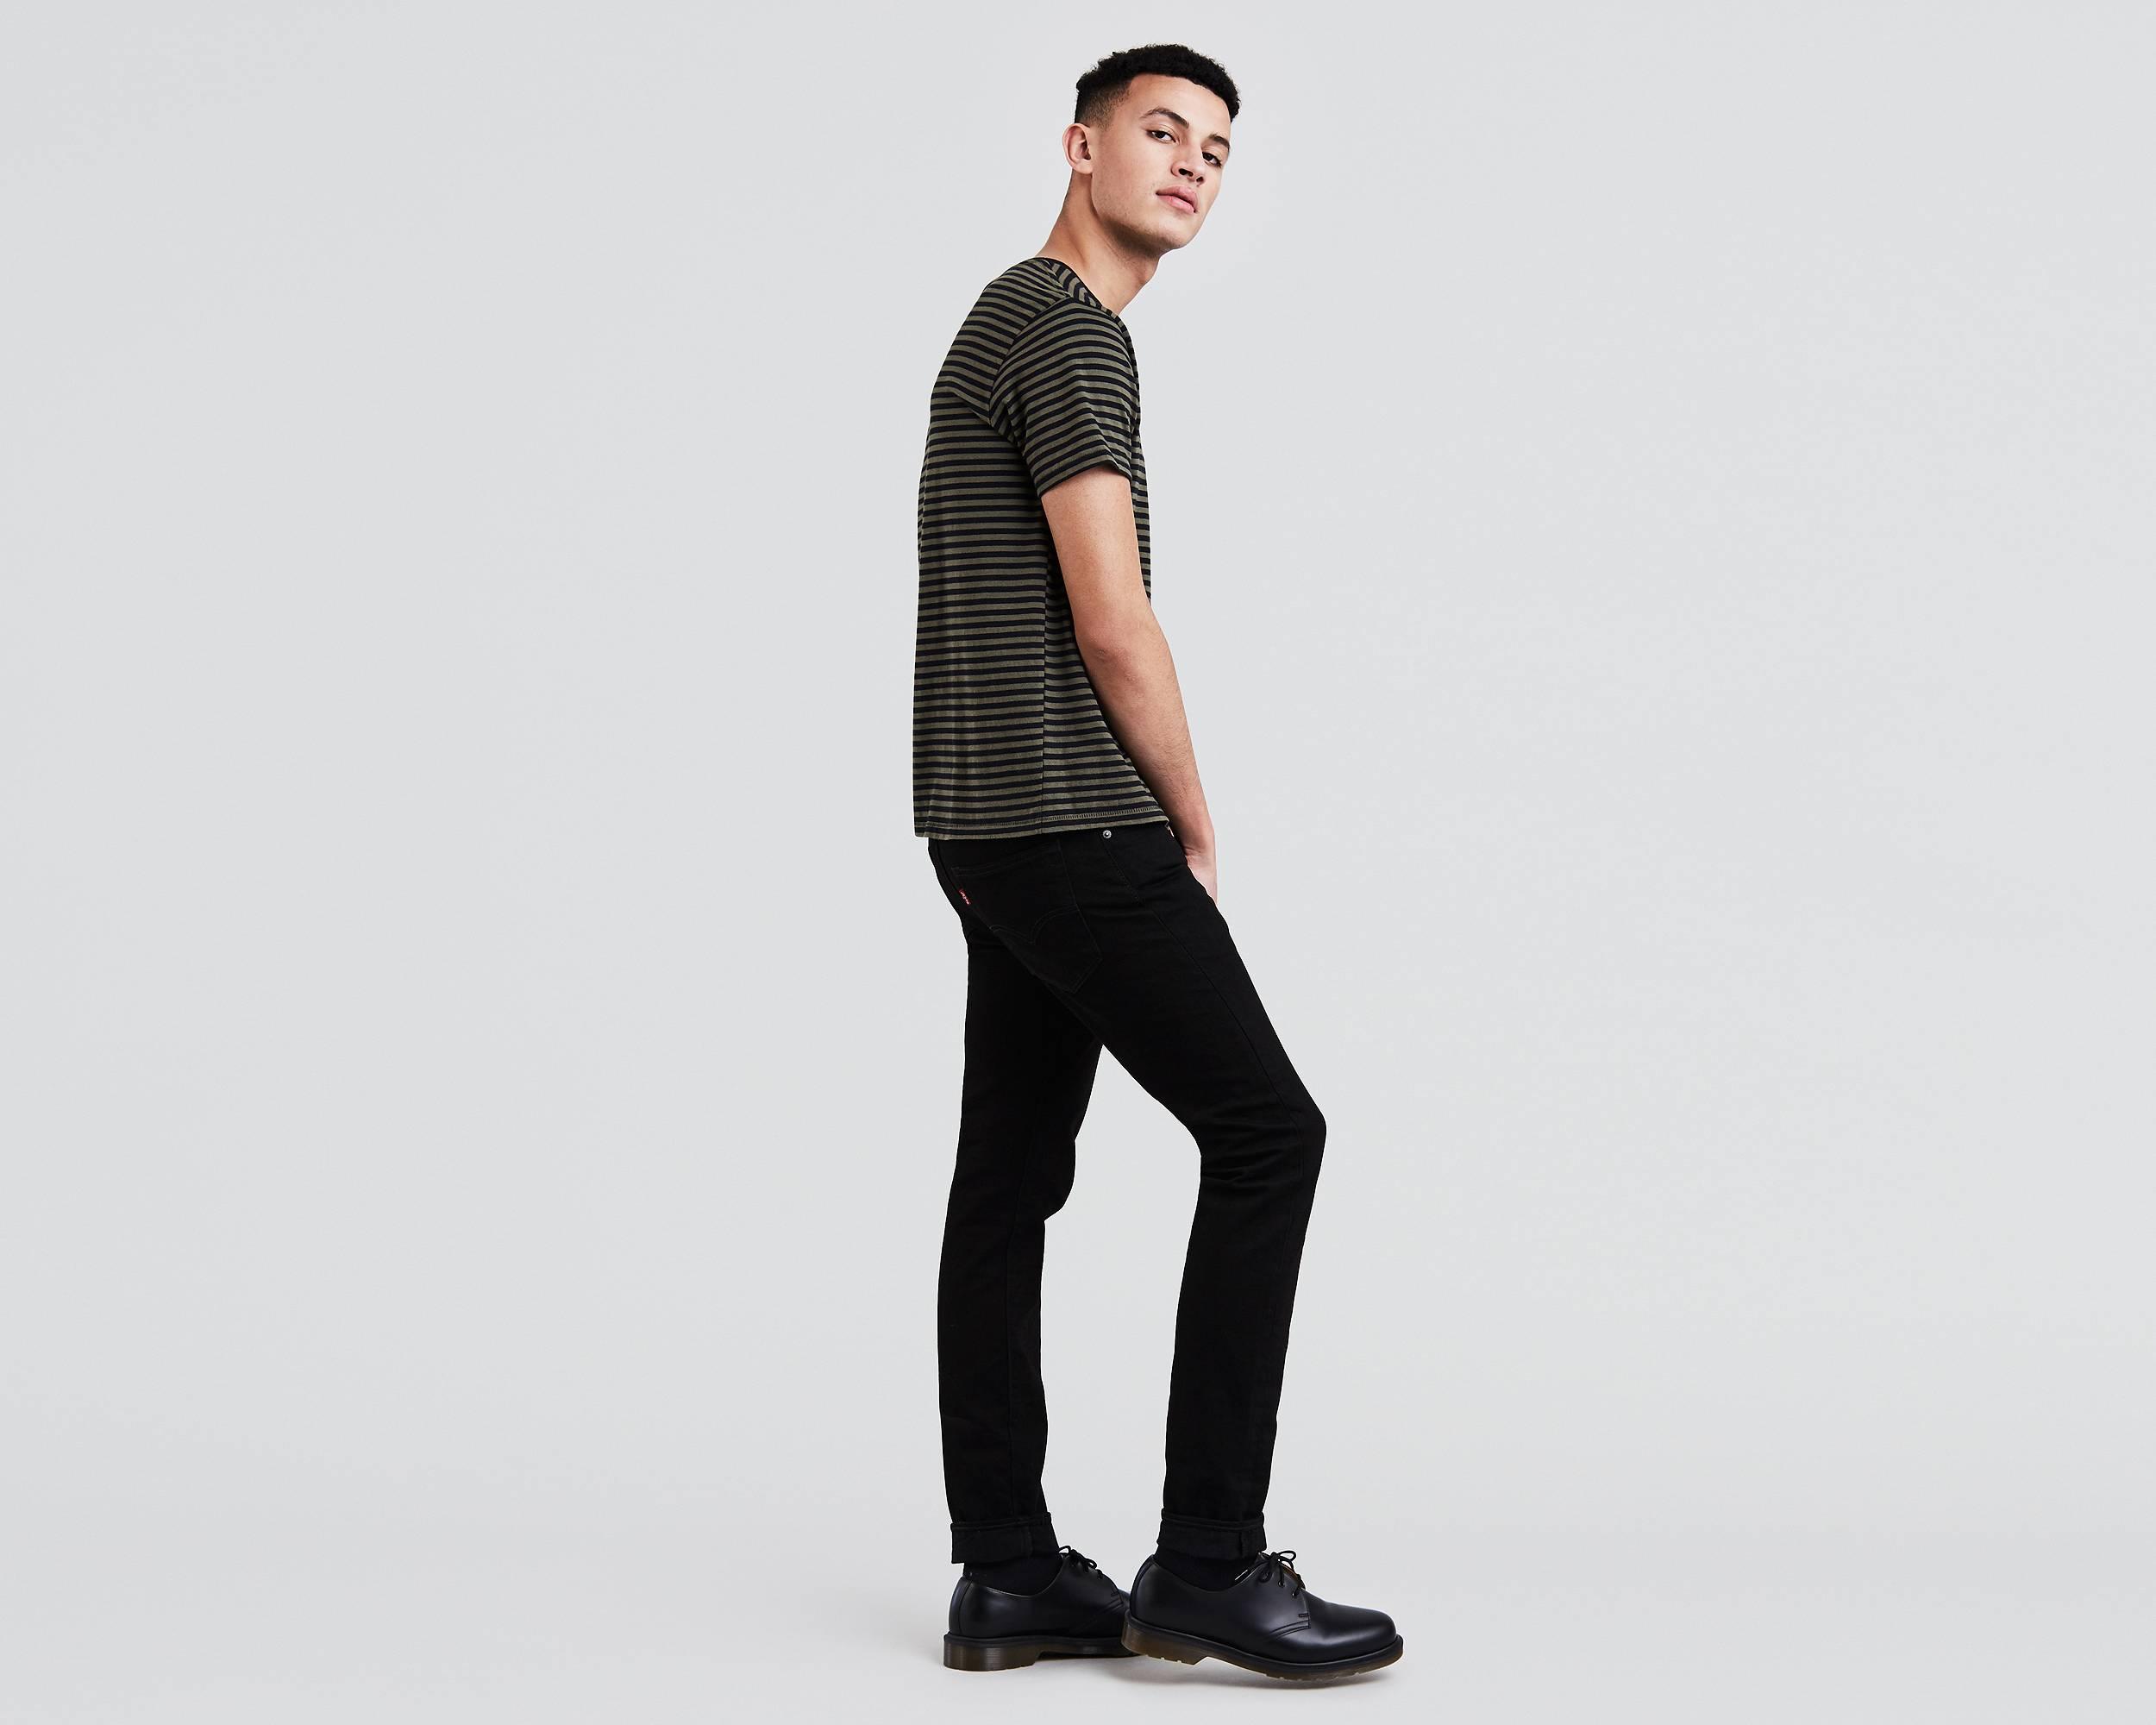 http://lsco1.scene7.com/is/image/lsco/Levi/clothing/342680000-side-pdp.jpg?$2500x2000$